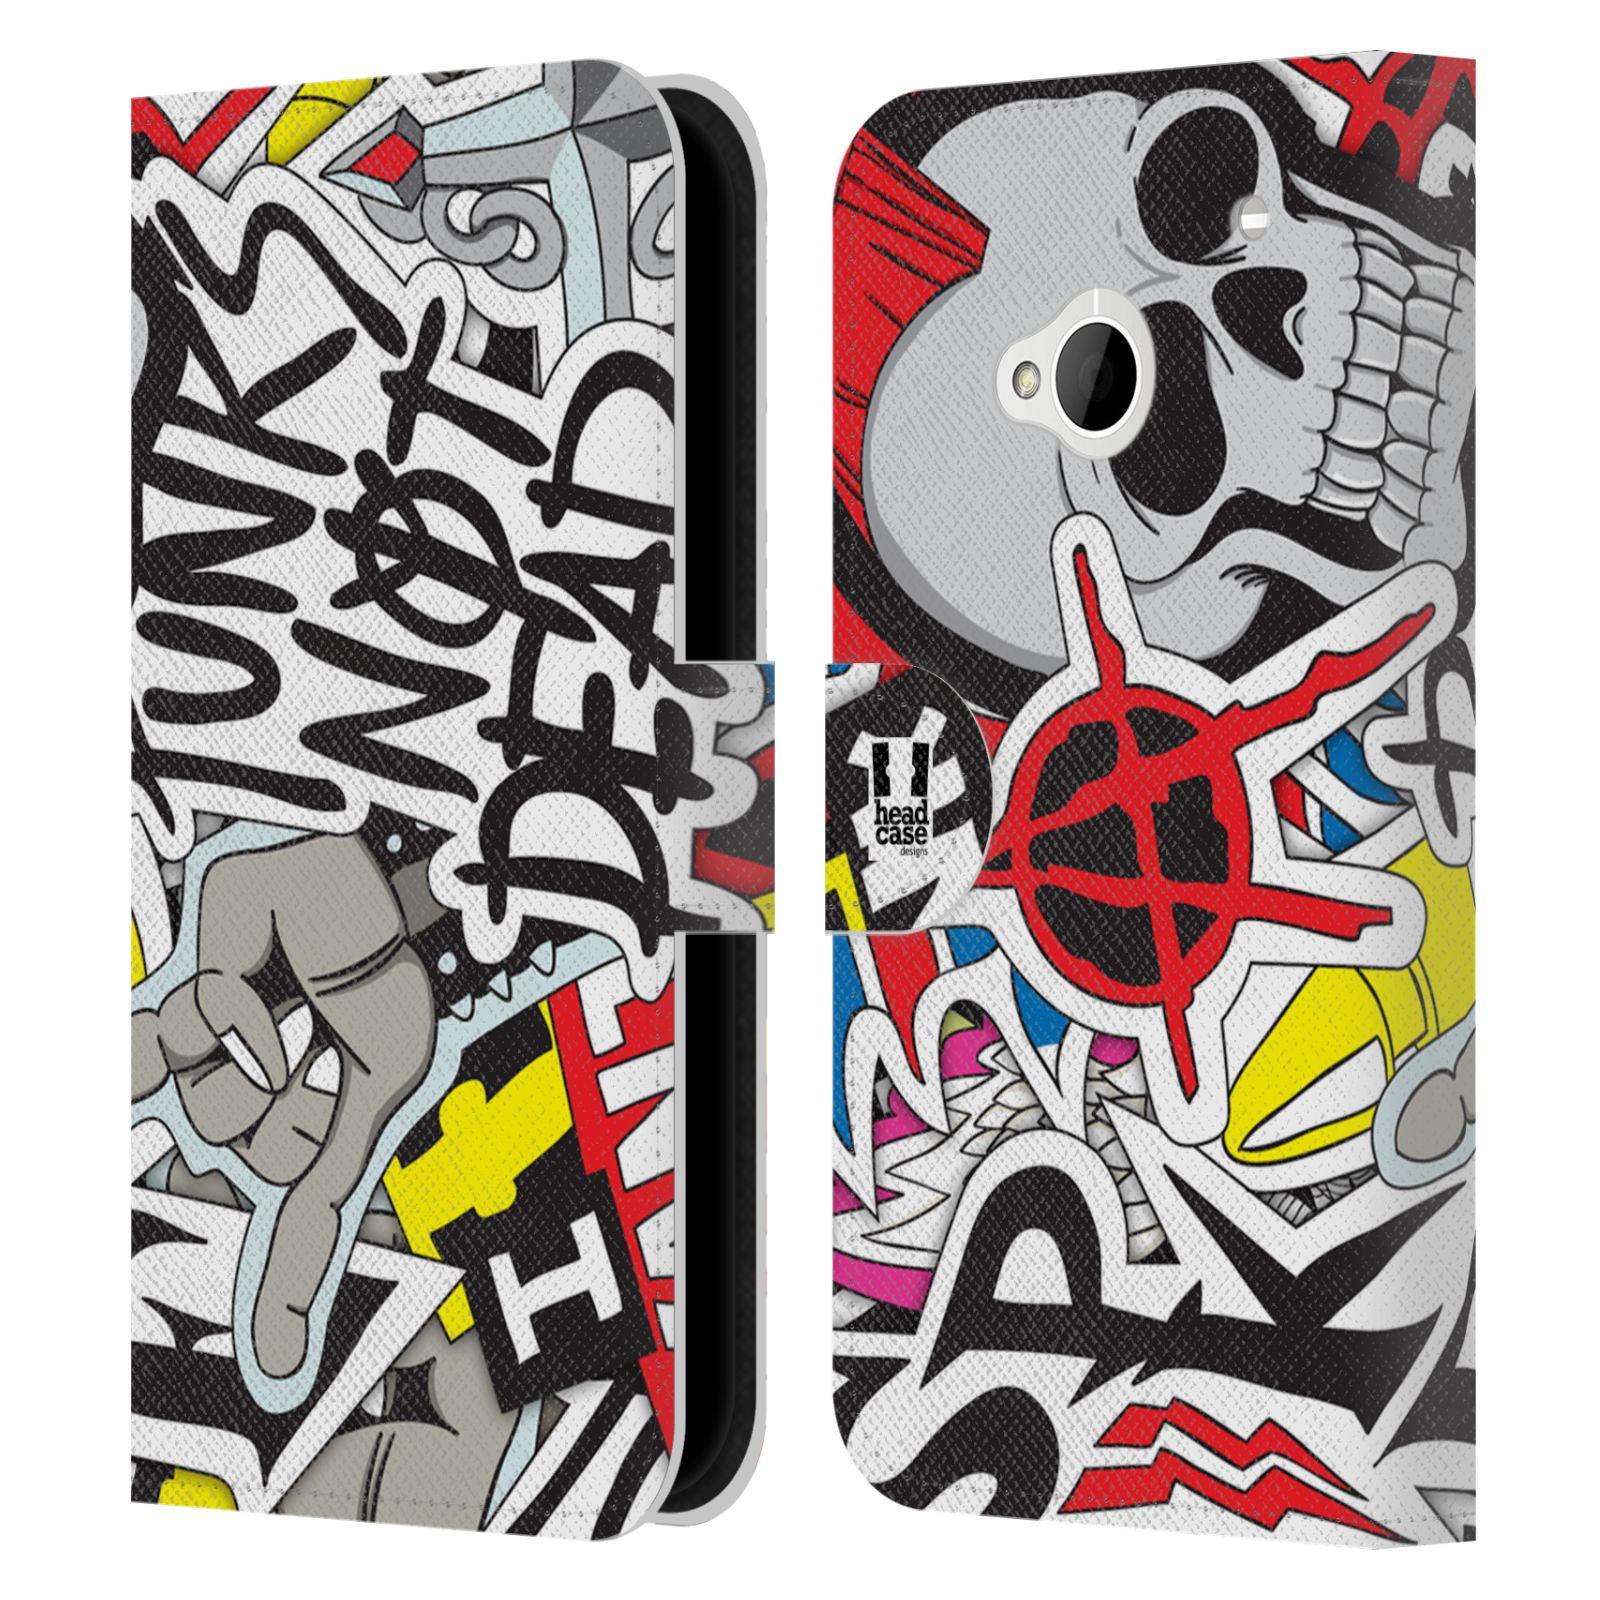 HEAD CASE Flipové pouzdro pro mobil HTC ONE (M7) vzor STICKER nálepky PUNK IS NOT DEAD